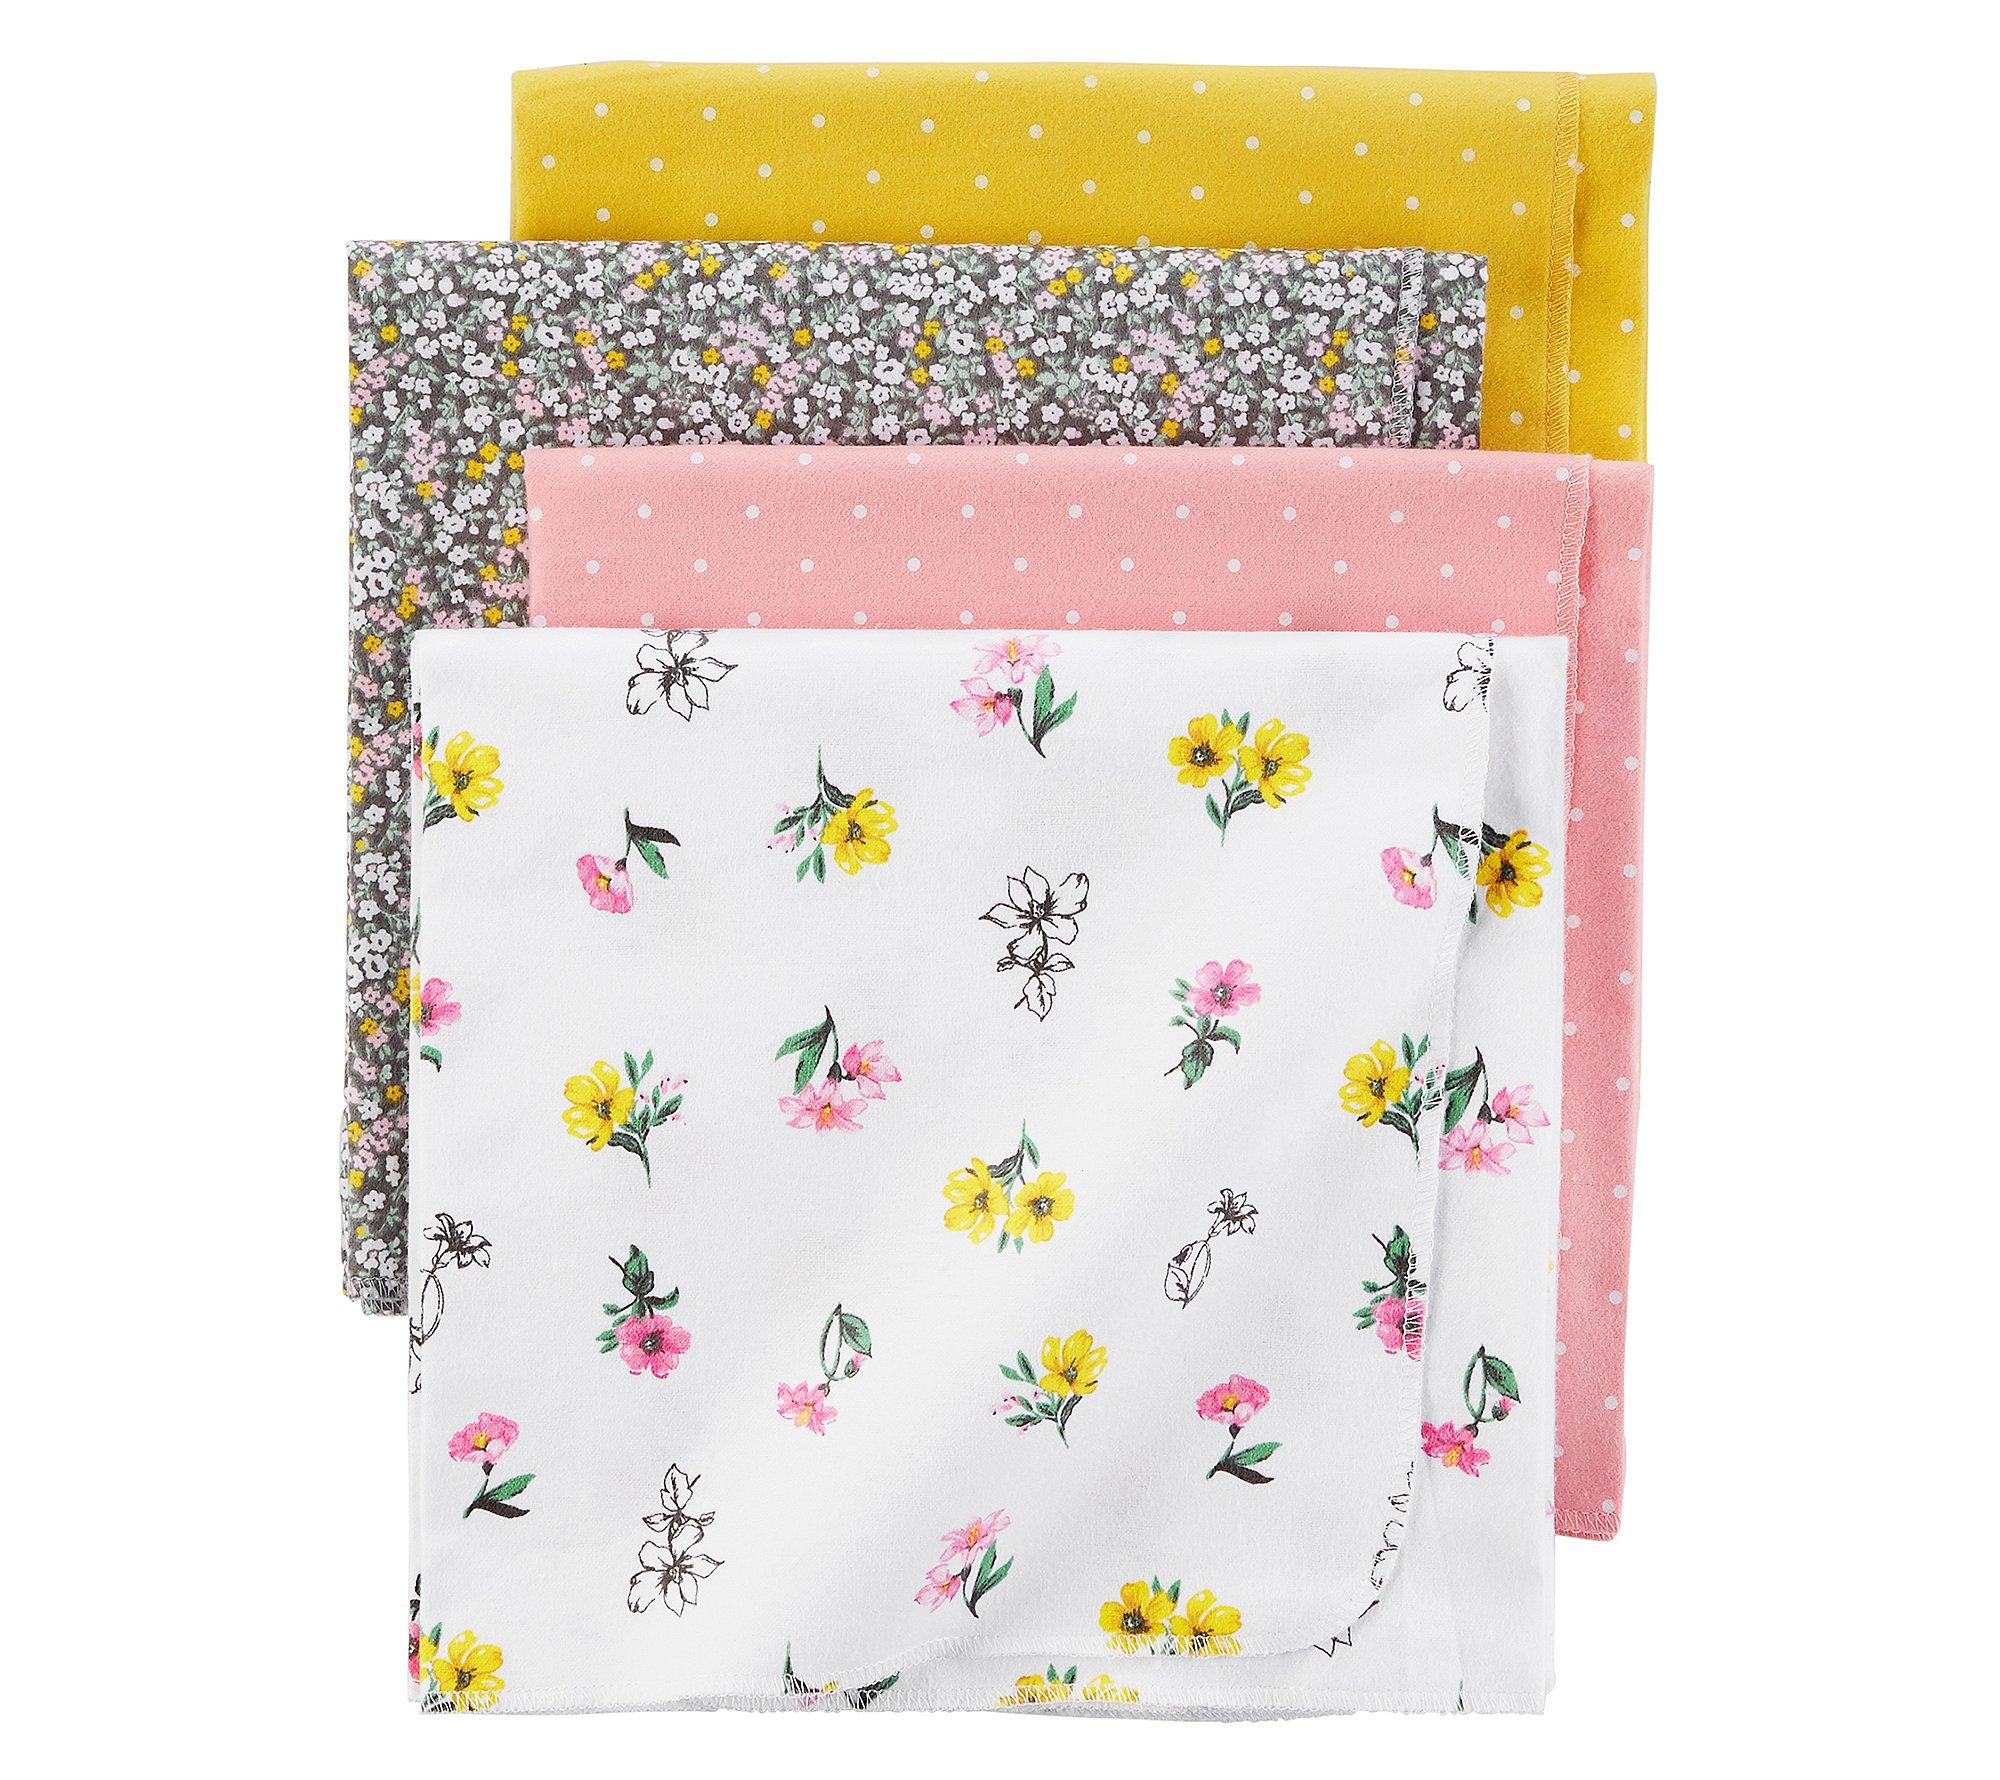 Carter's 4-Pack Receiving Blanket by Carter's